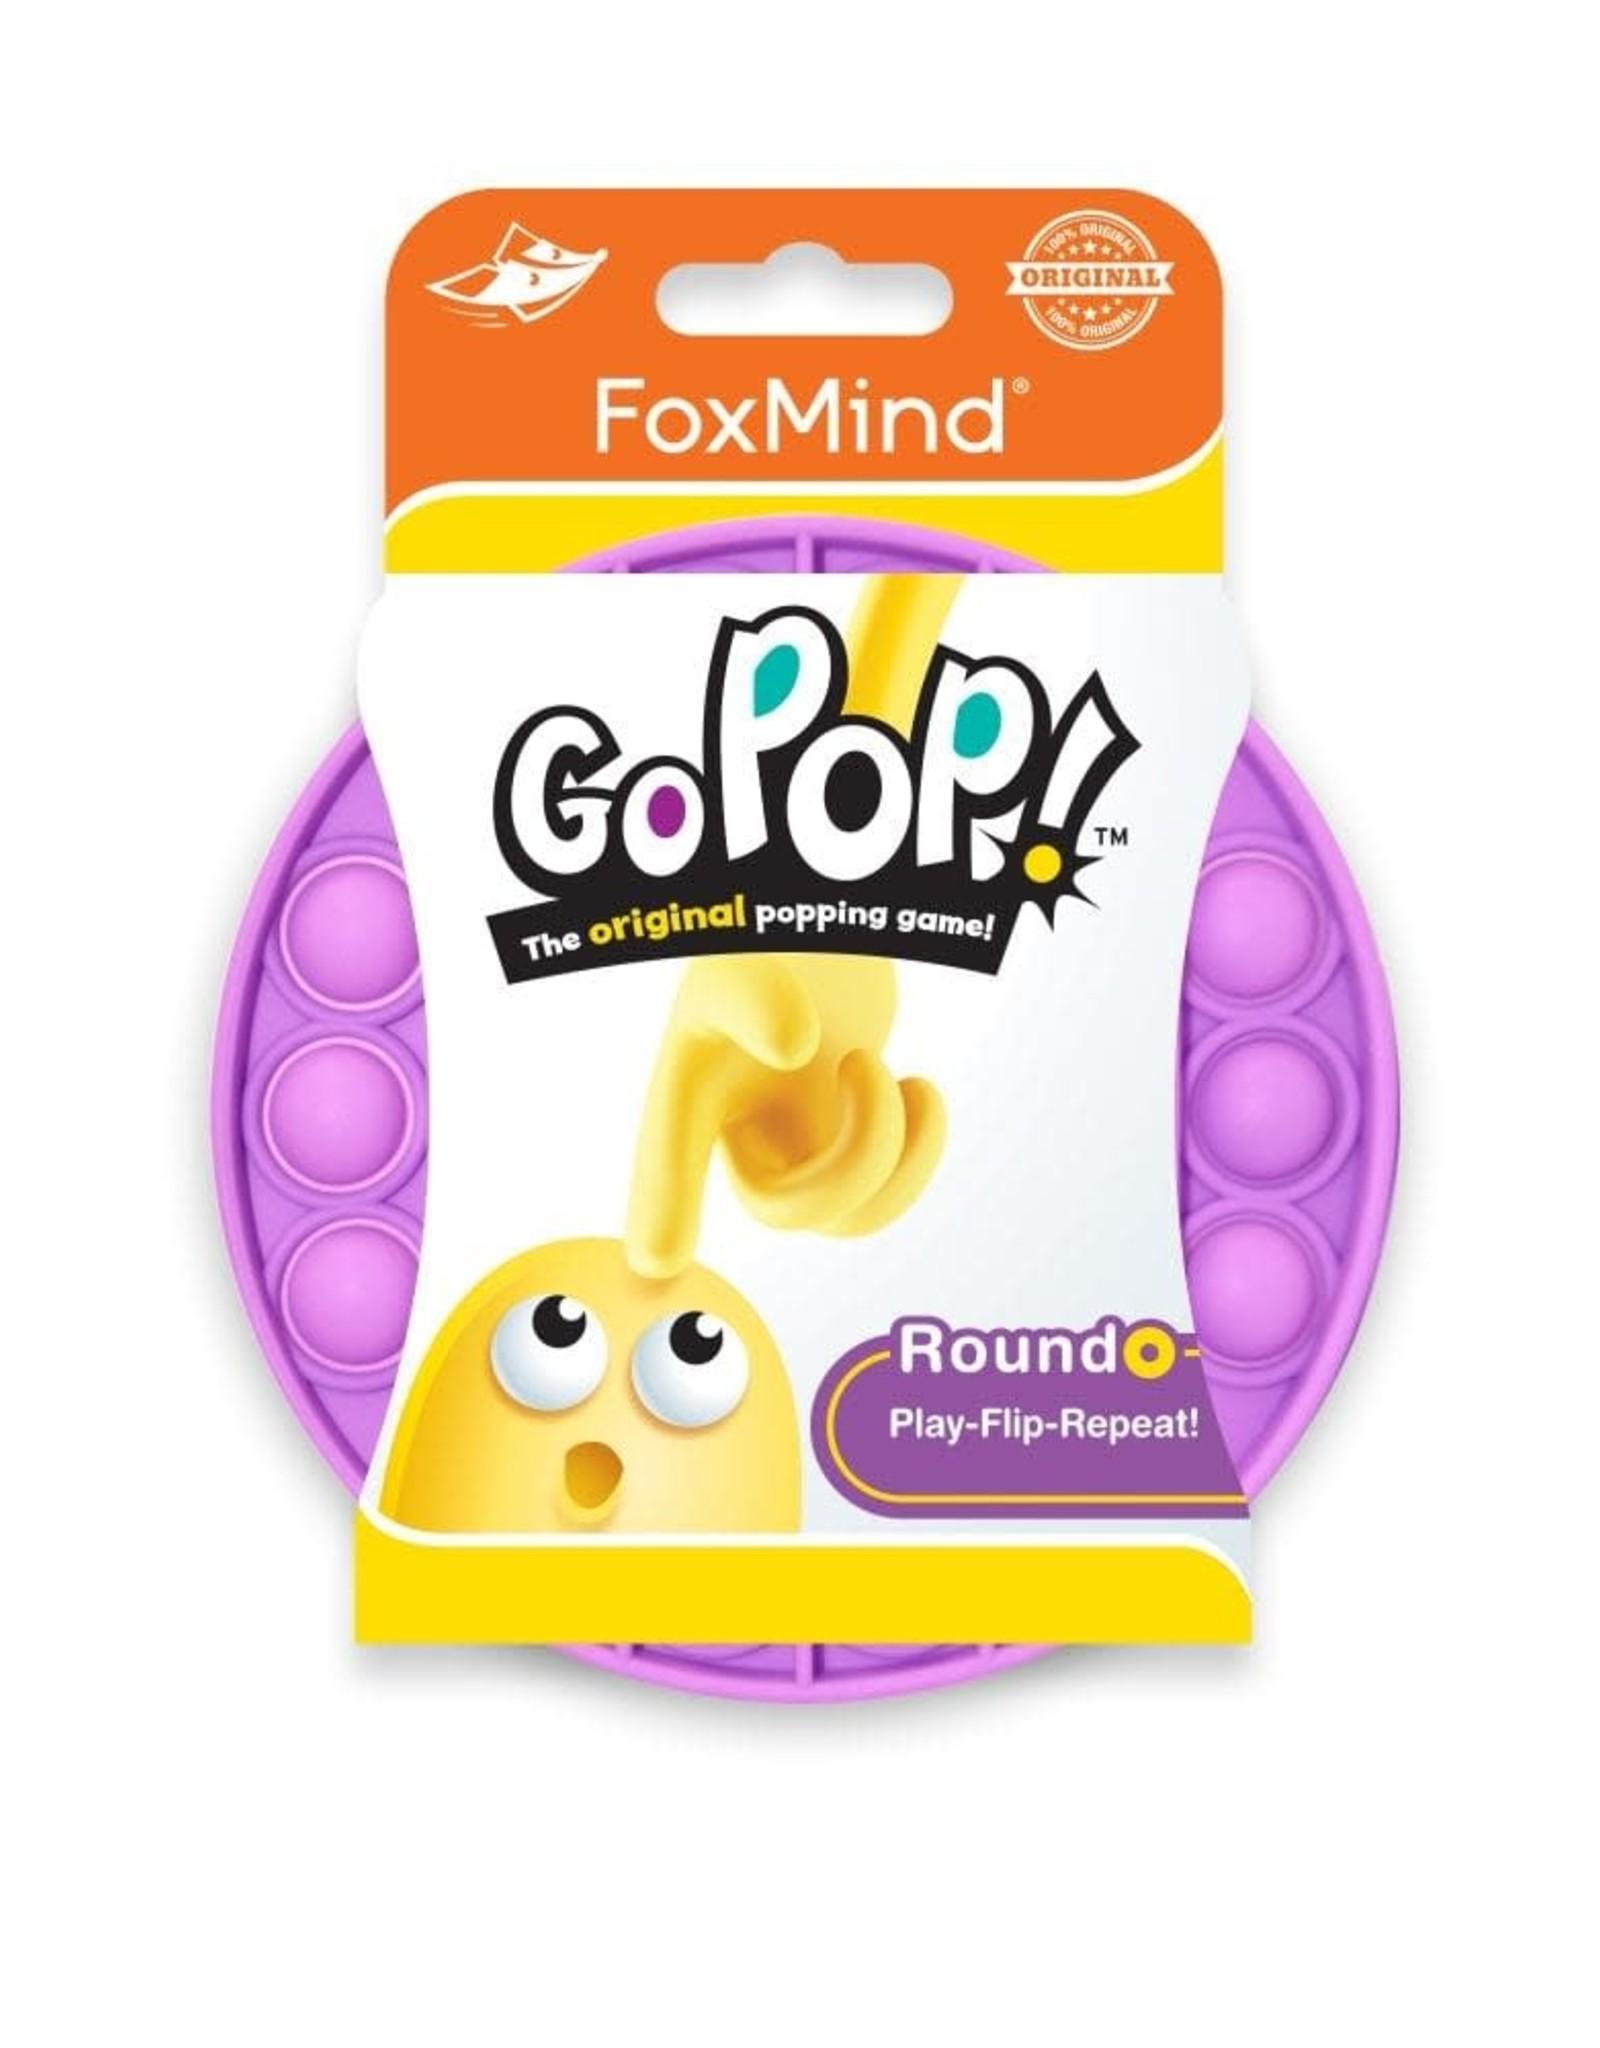 Foxmind Go Pop Roundo (Last One Lost)